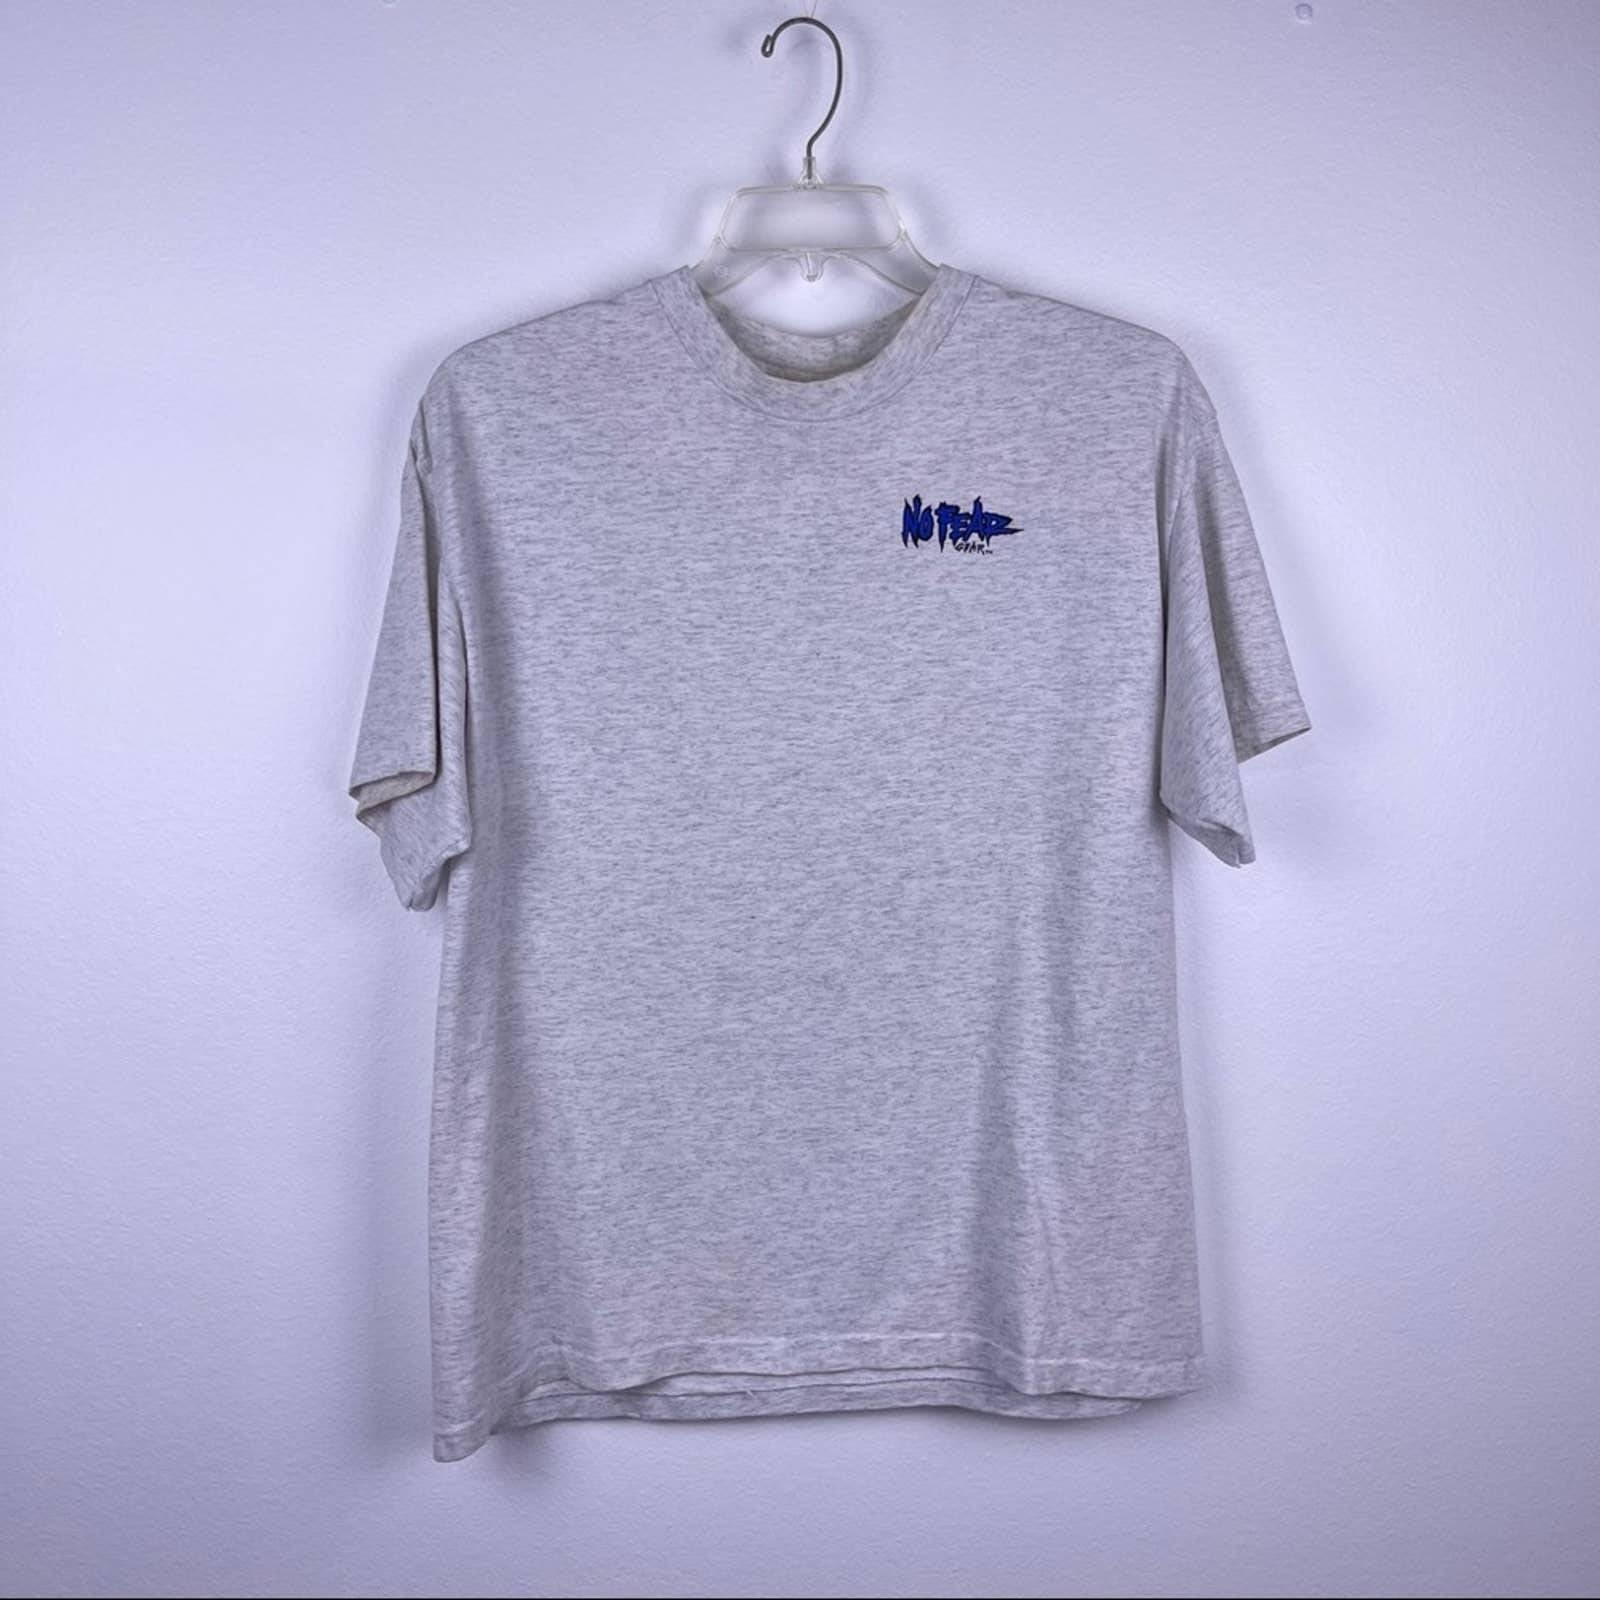 Vintage No fear Gear Will Race T Shirt